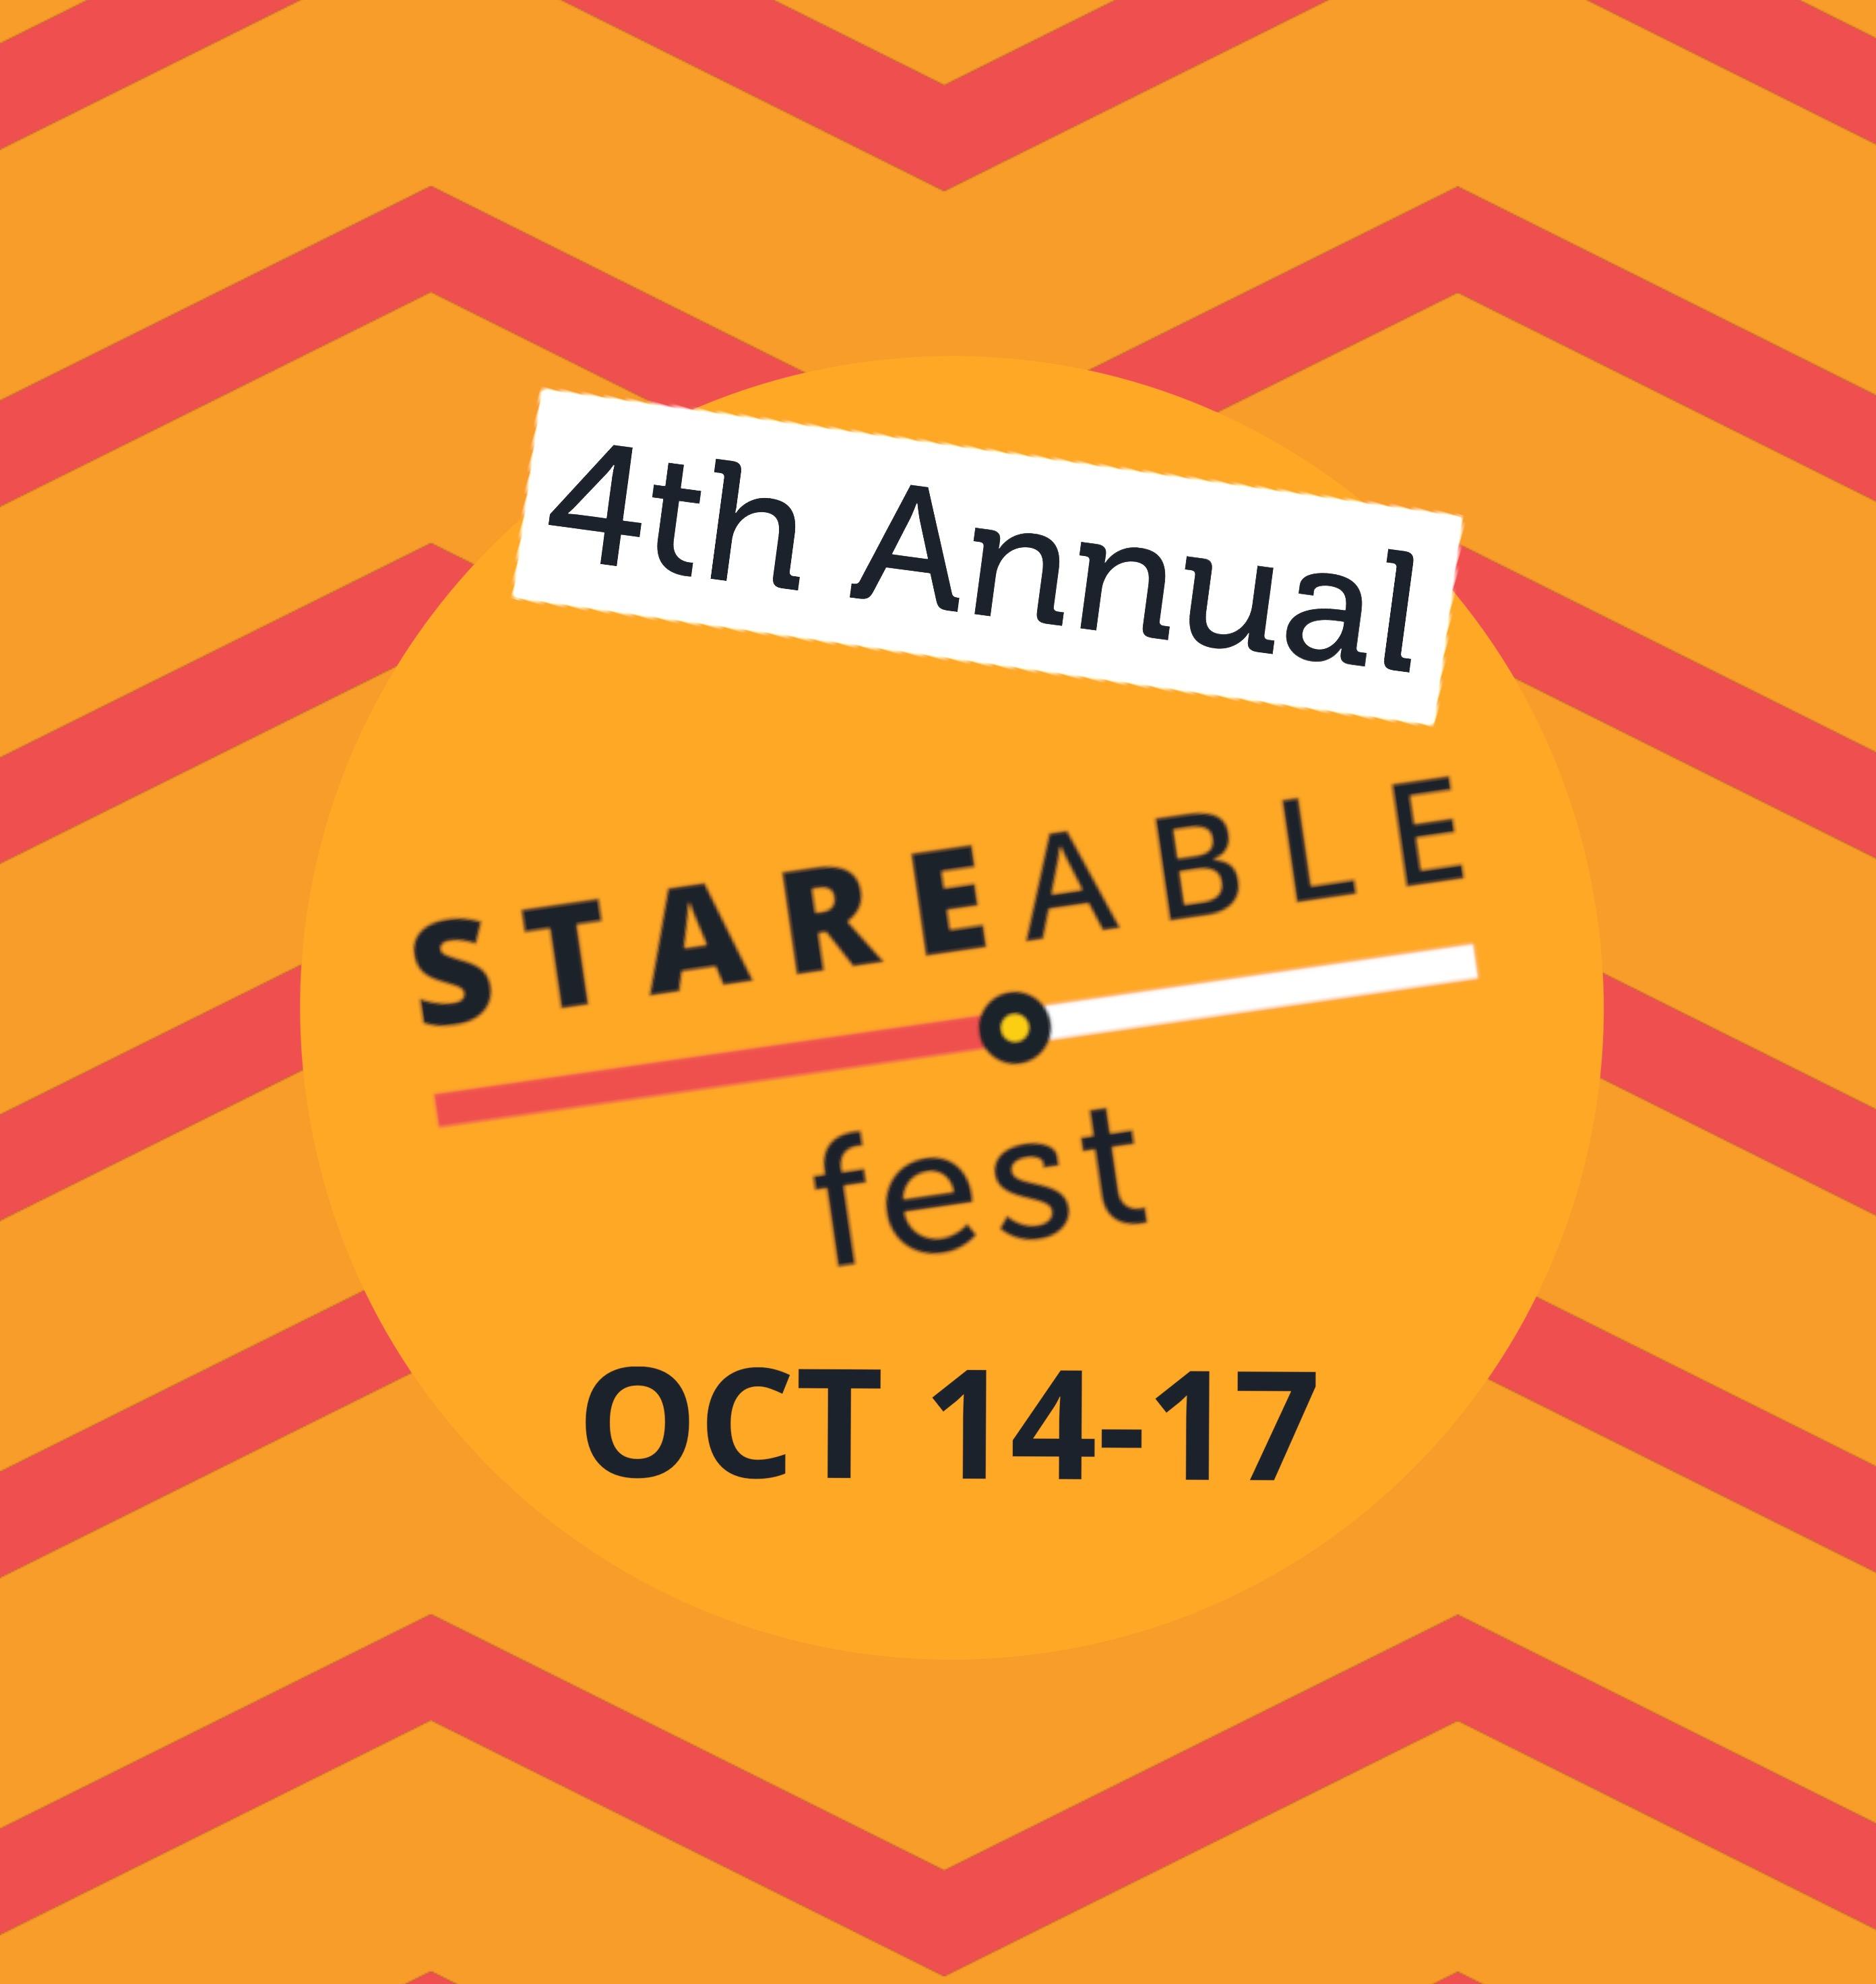 Stareable Fest 2021